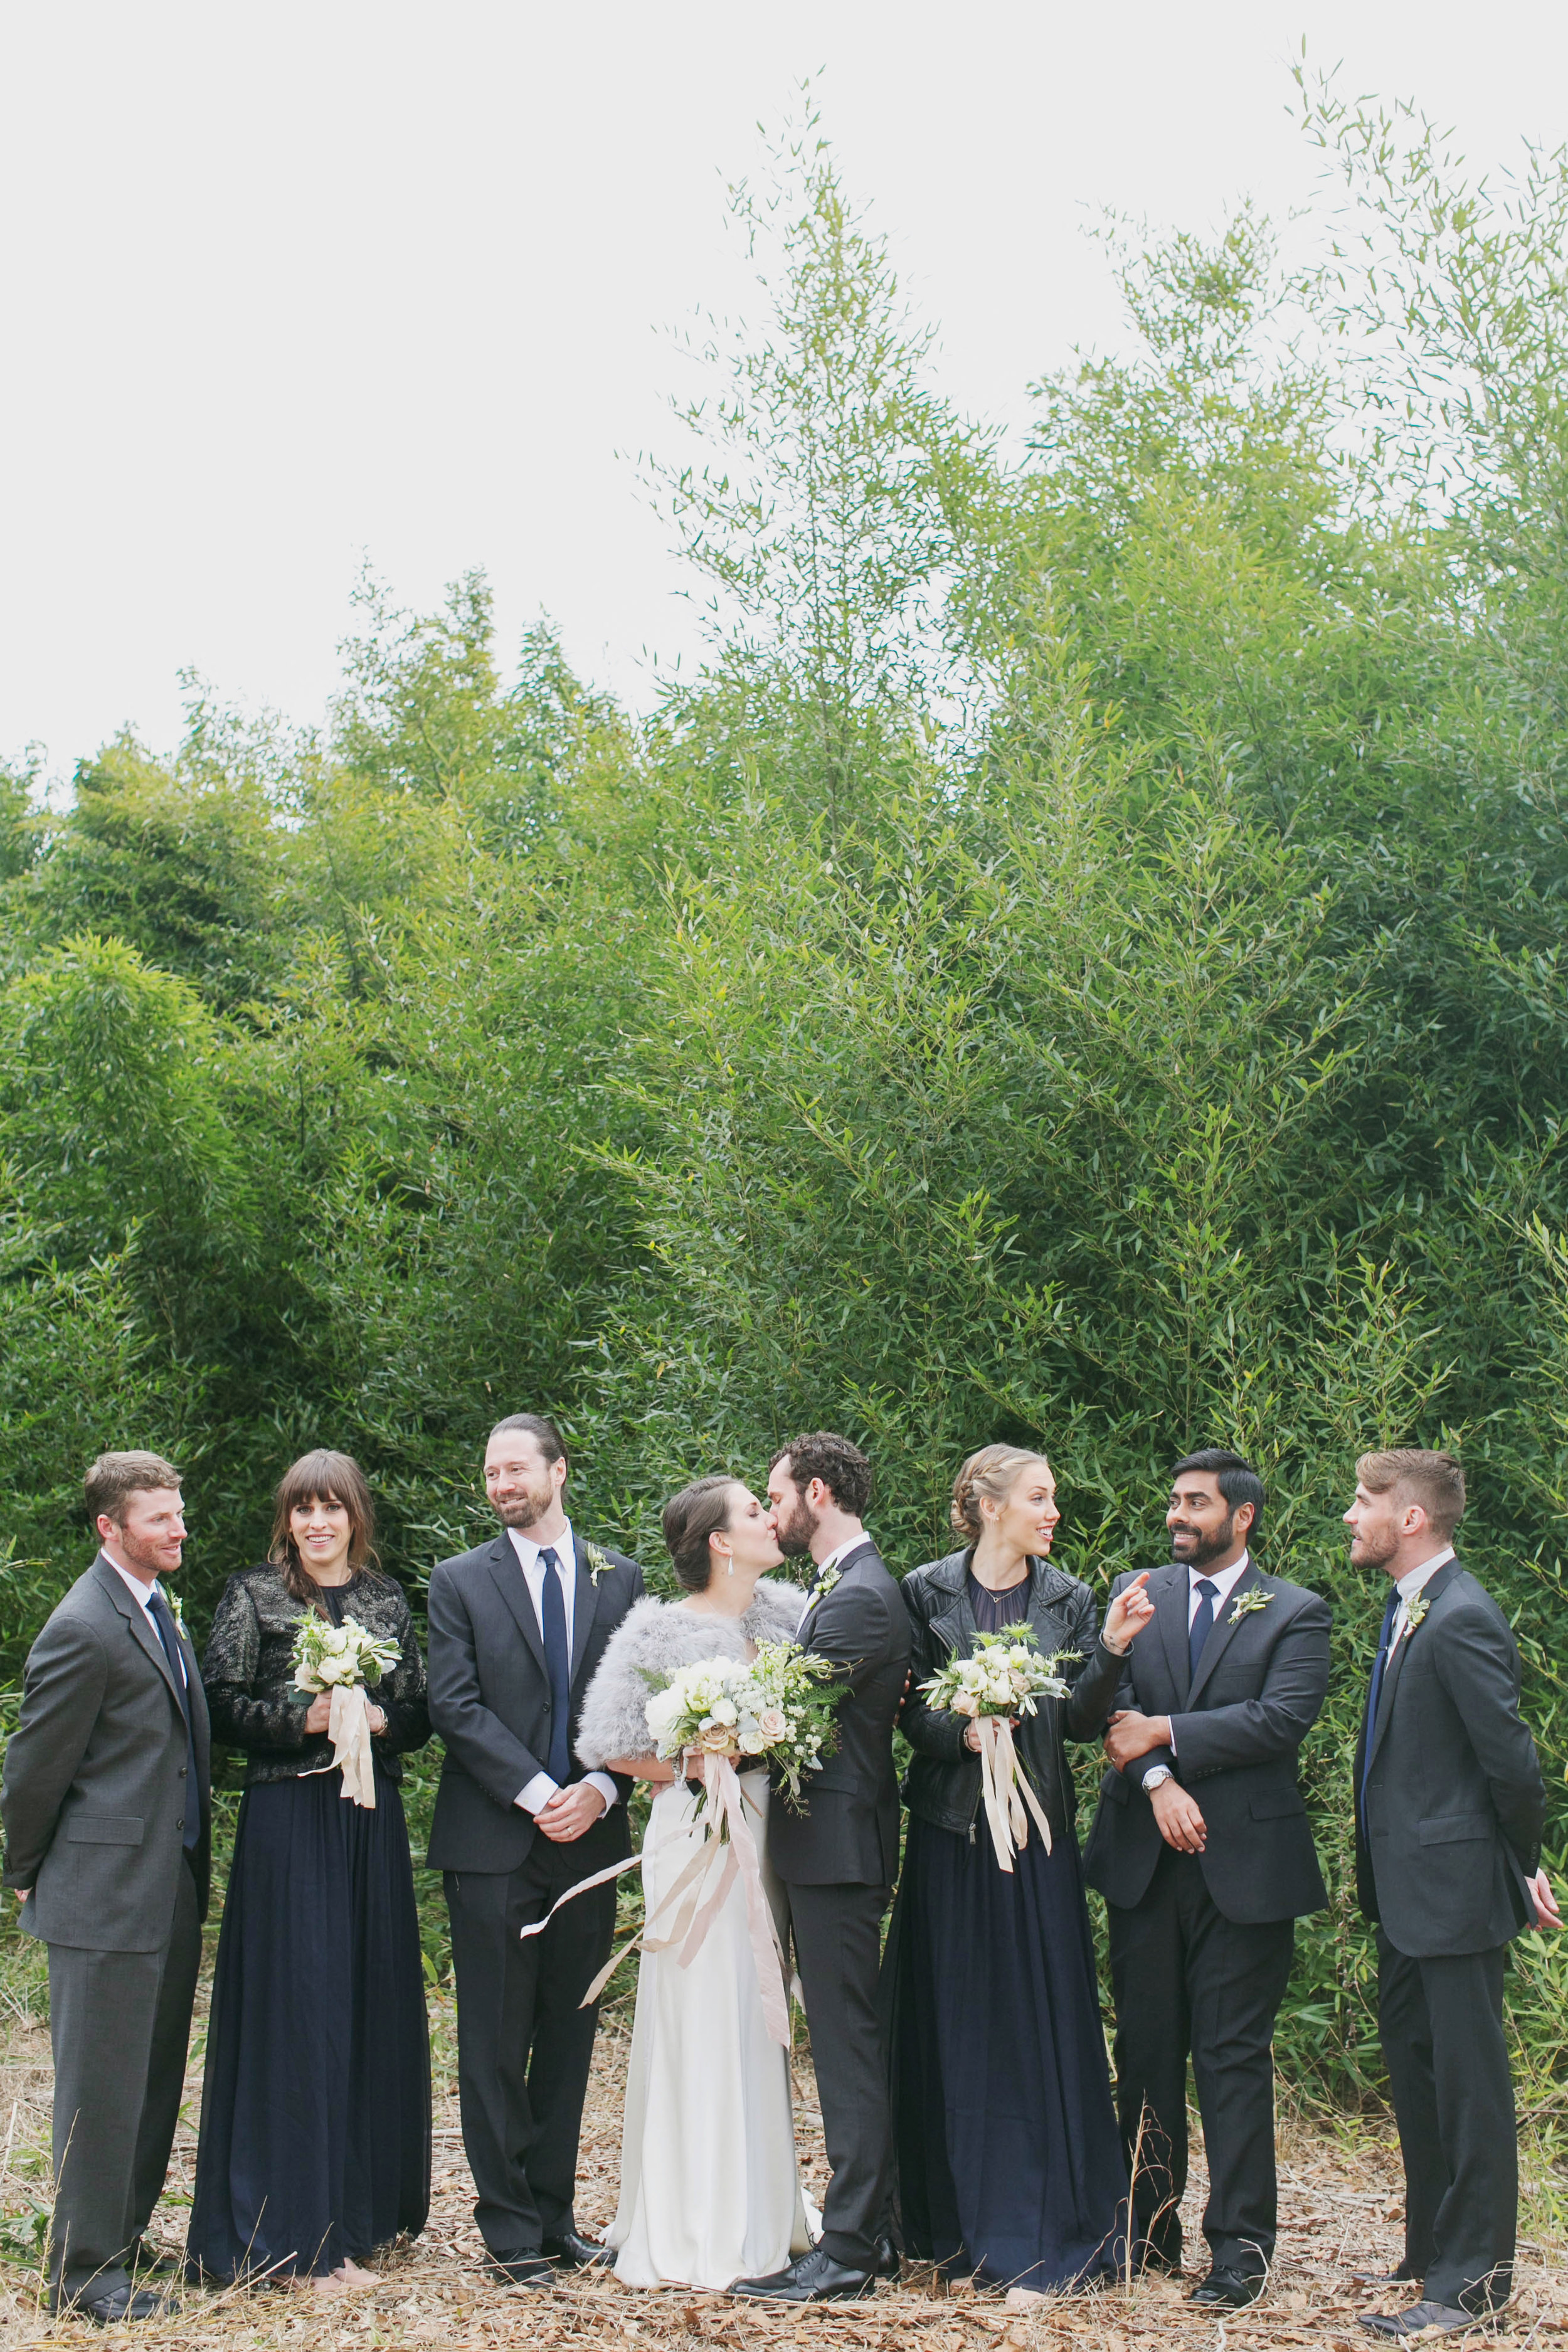 Simply-Charming-Socials_Atlanta-Wedding-Planner_Our-Labor-Of-Love_Emily-and-Jon_6.jpg